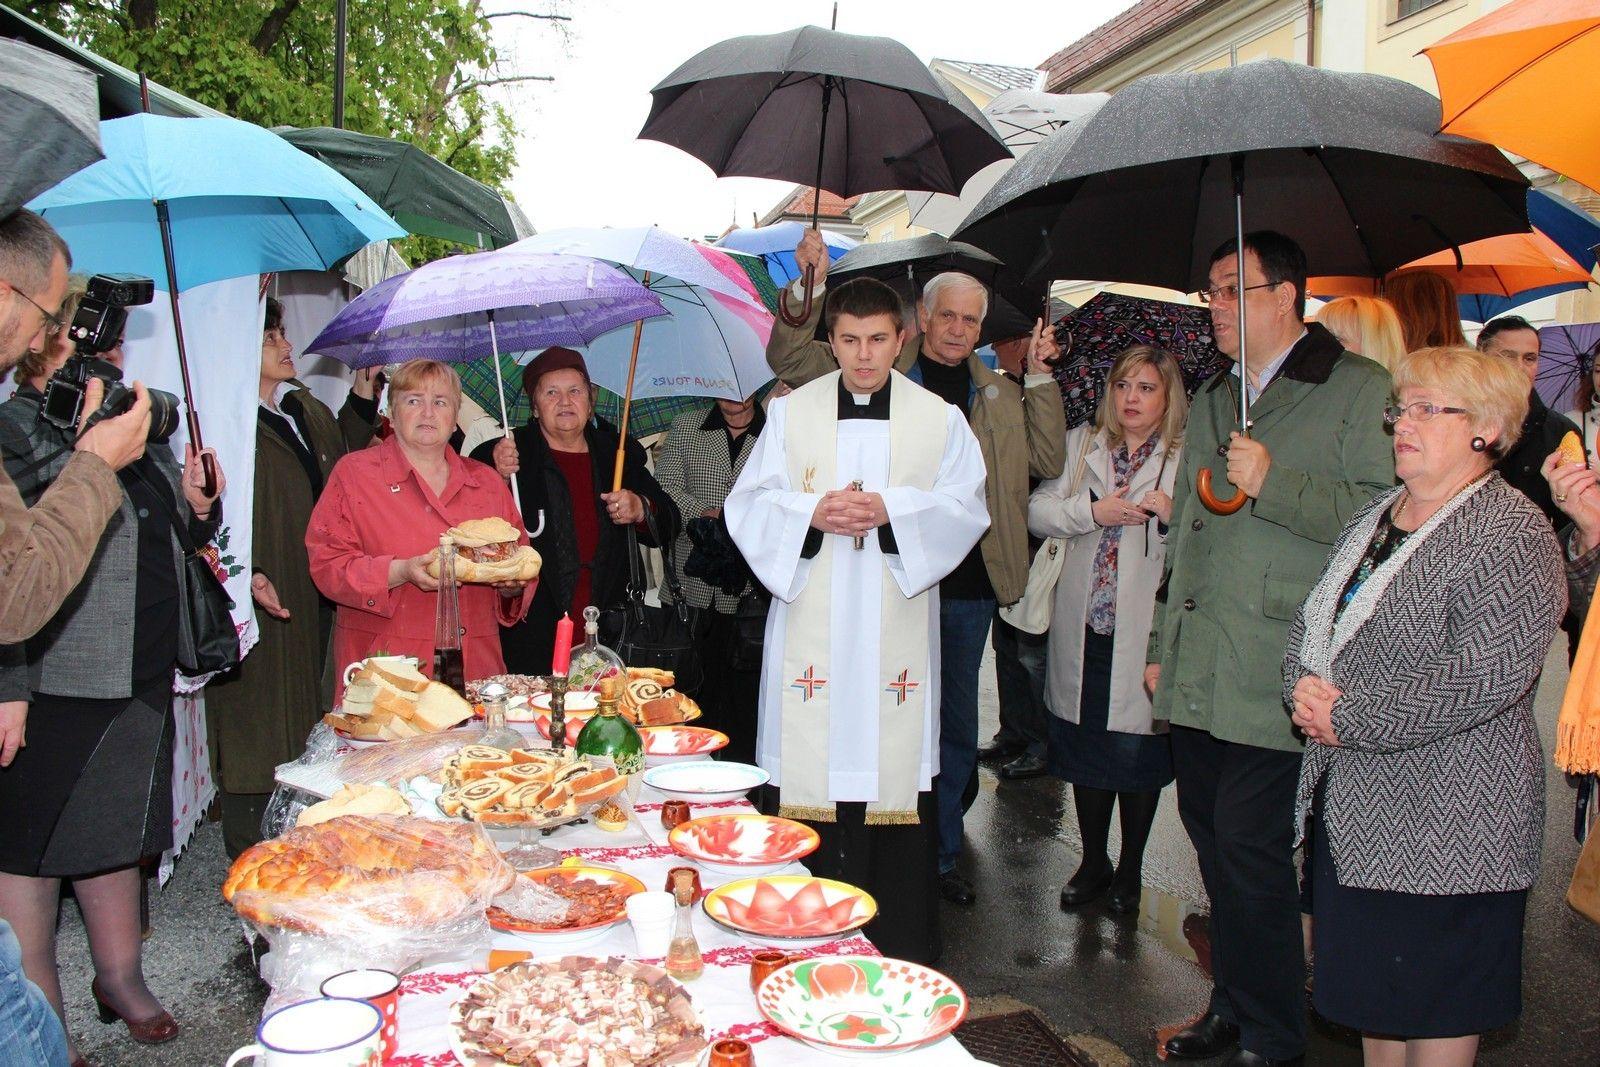 Upriličeno tradicionalno Uskrsno jutro bilogorskog kraja ispred bjelovarske katedrale